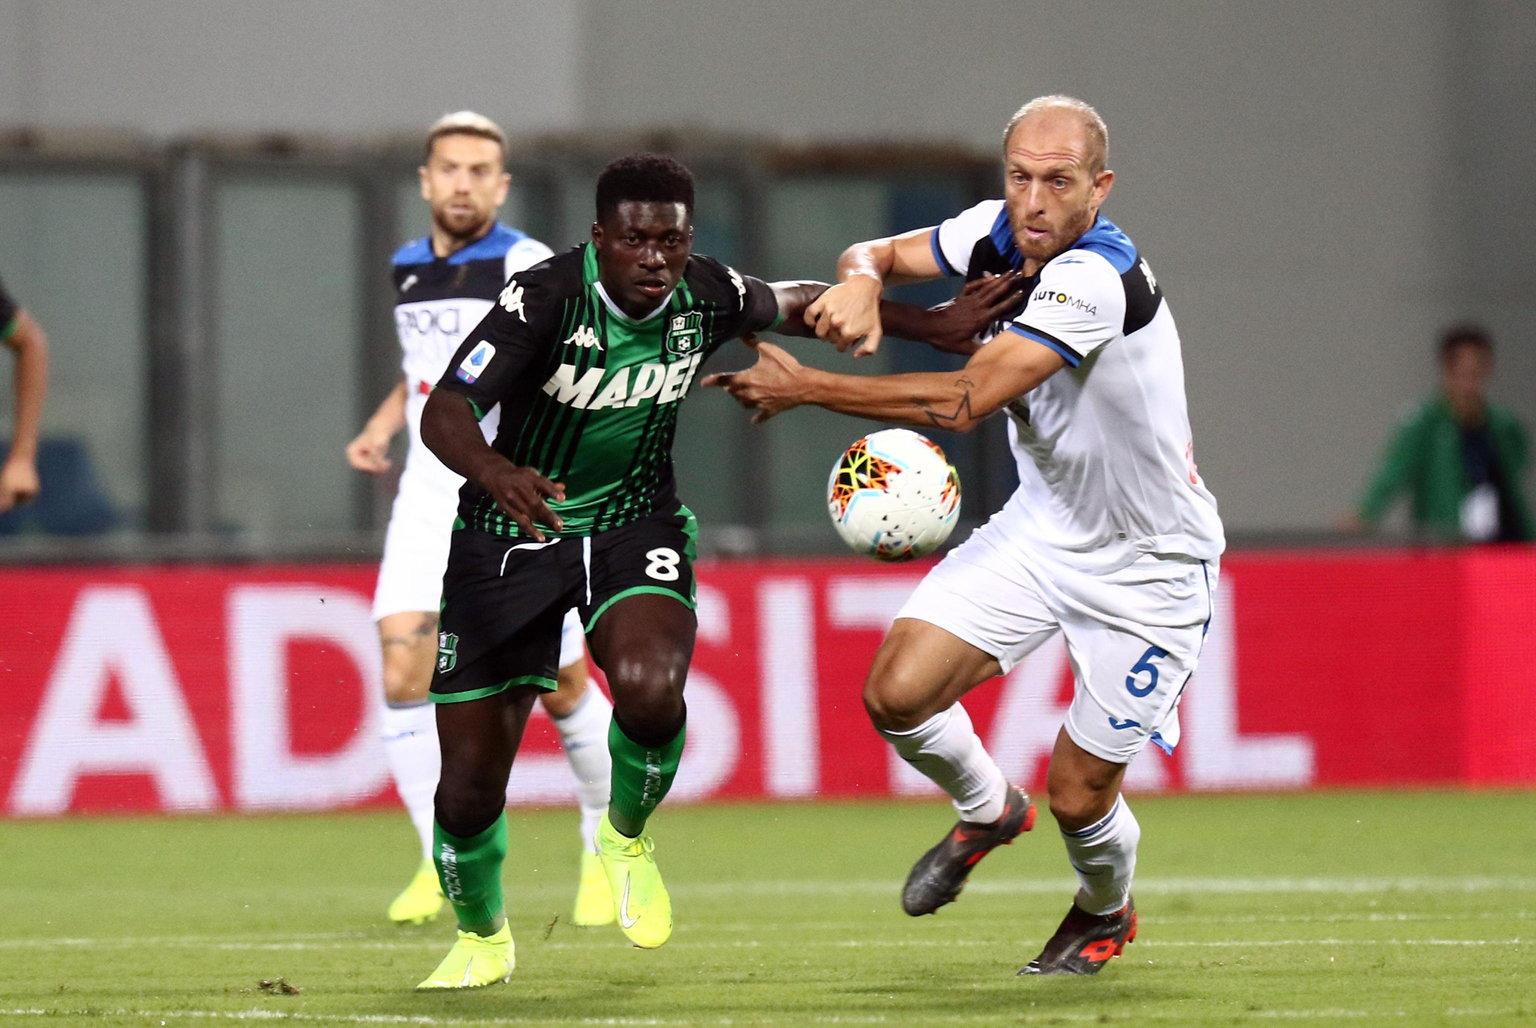 Serie A: Inter, Atalanta Continue Champions League Ticket Pursuit Live On DStv, GOtv